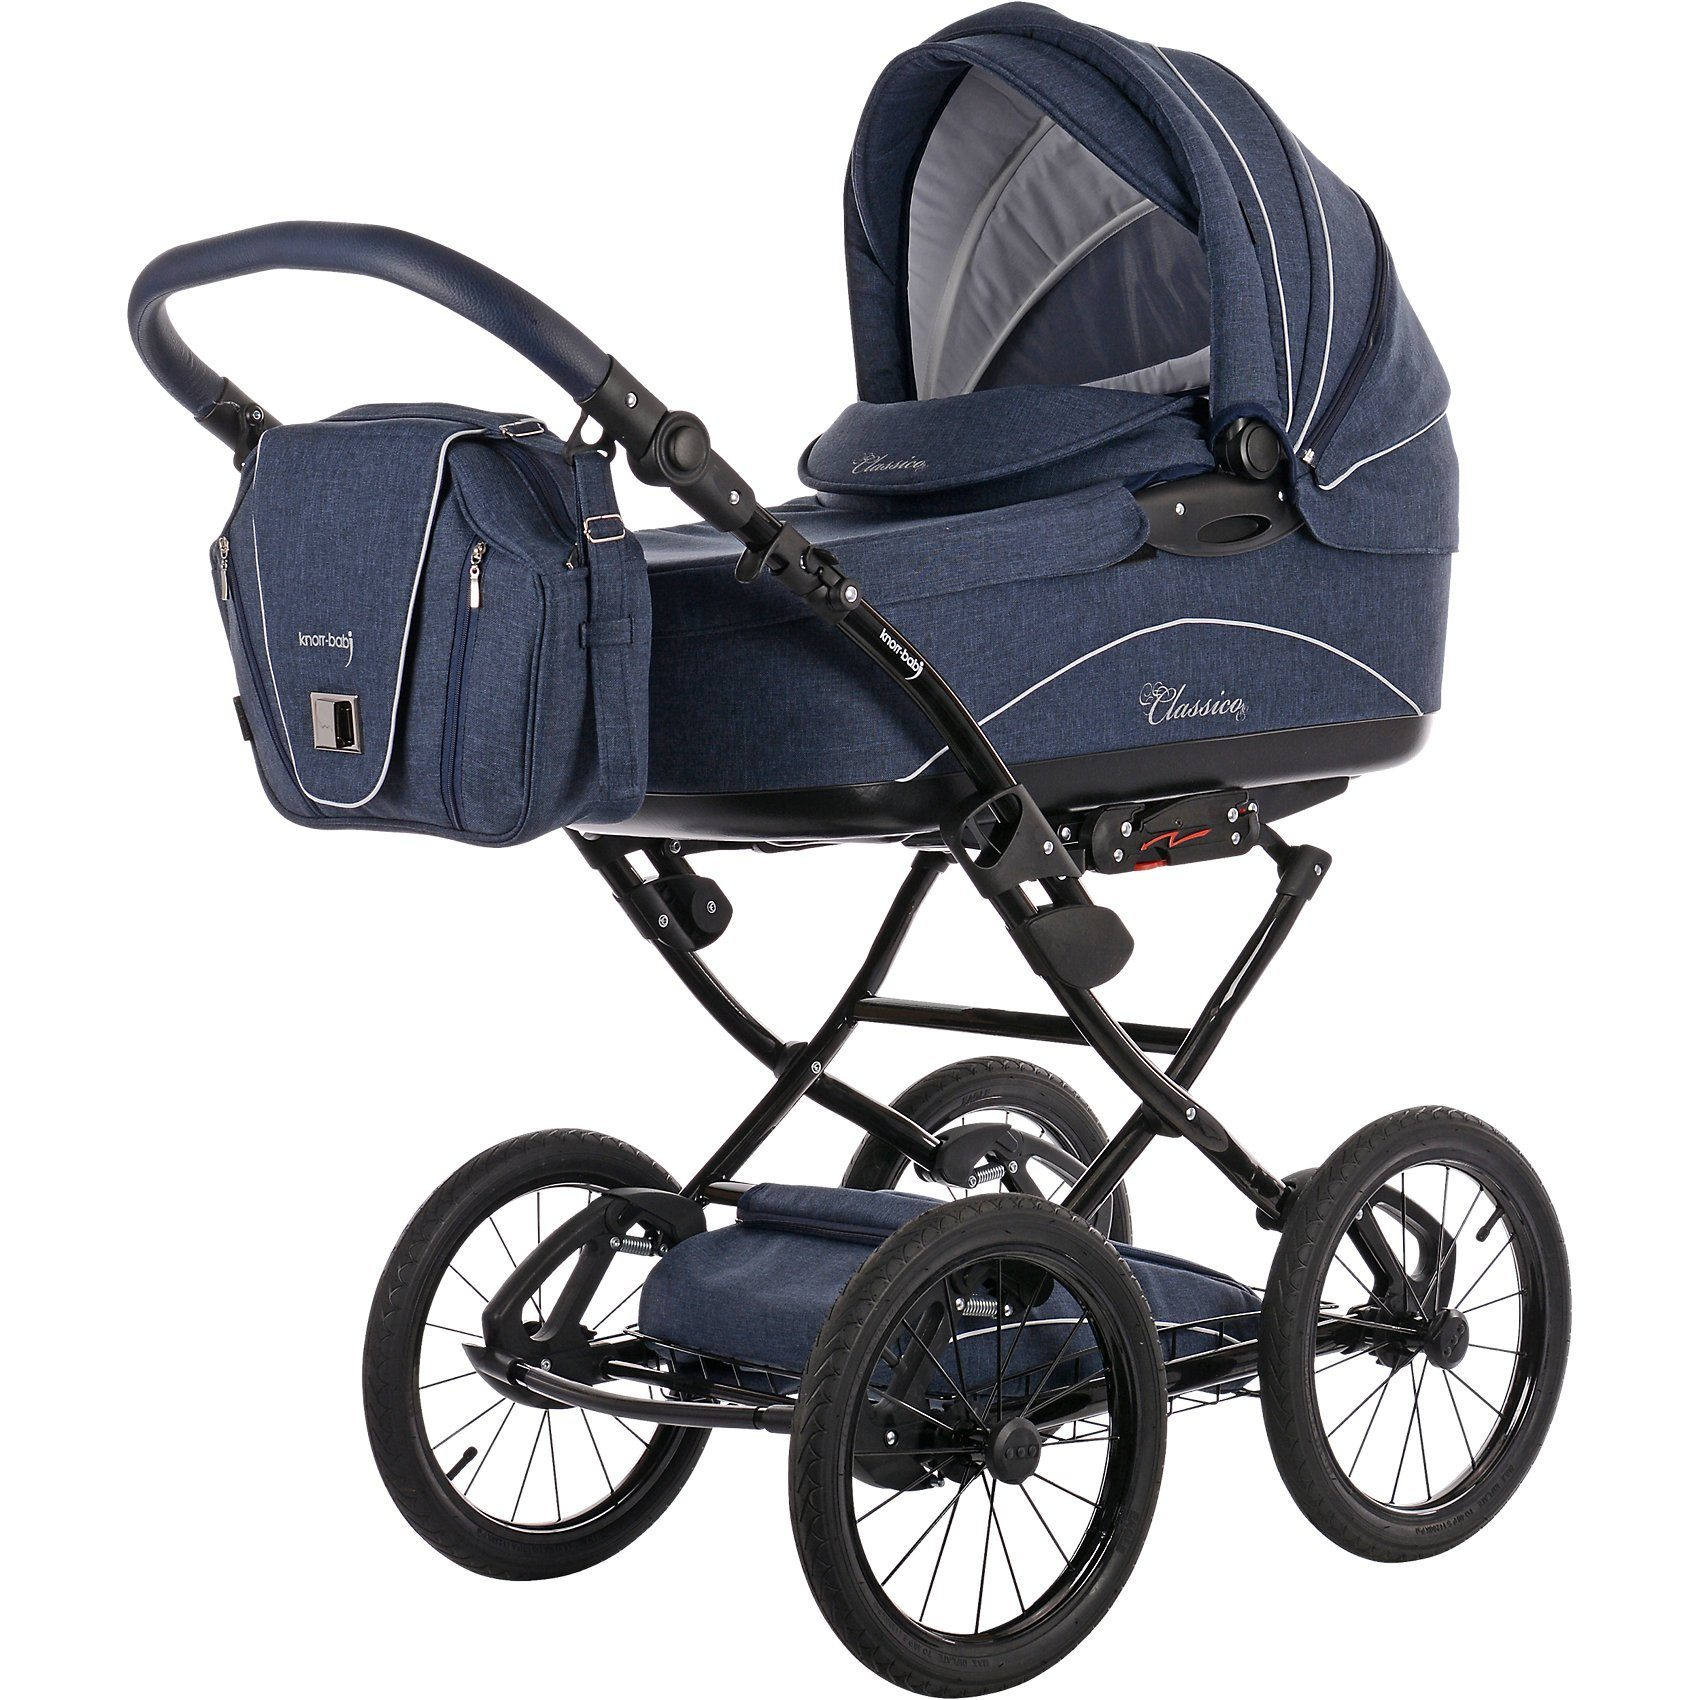 knorr-baby Kombi Kinderwagen Classico mit Wickeltasche & Handwärmer, ma